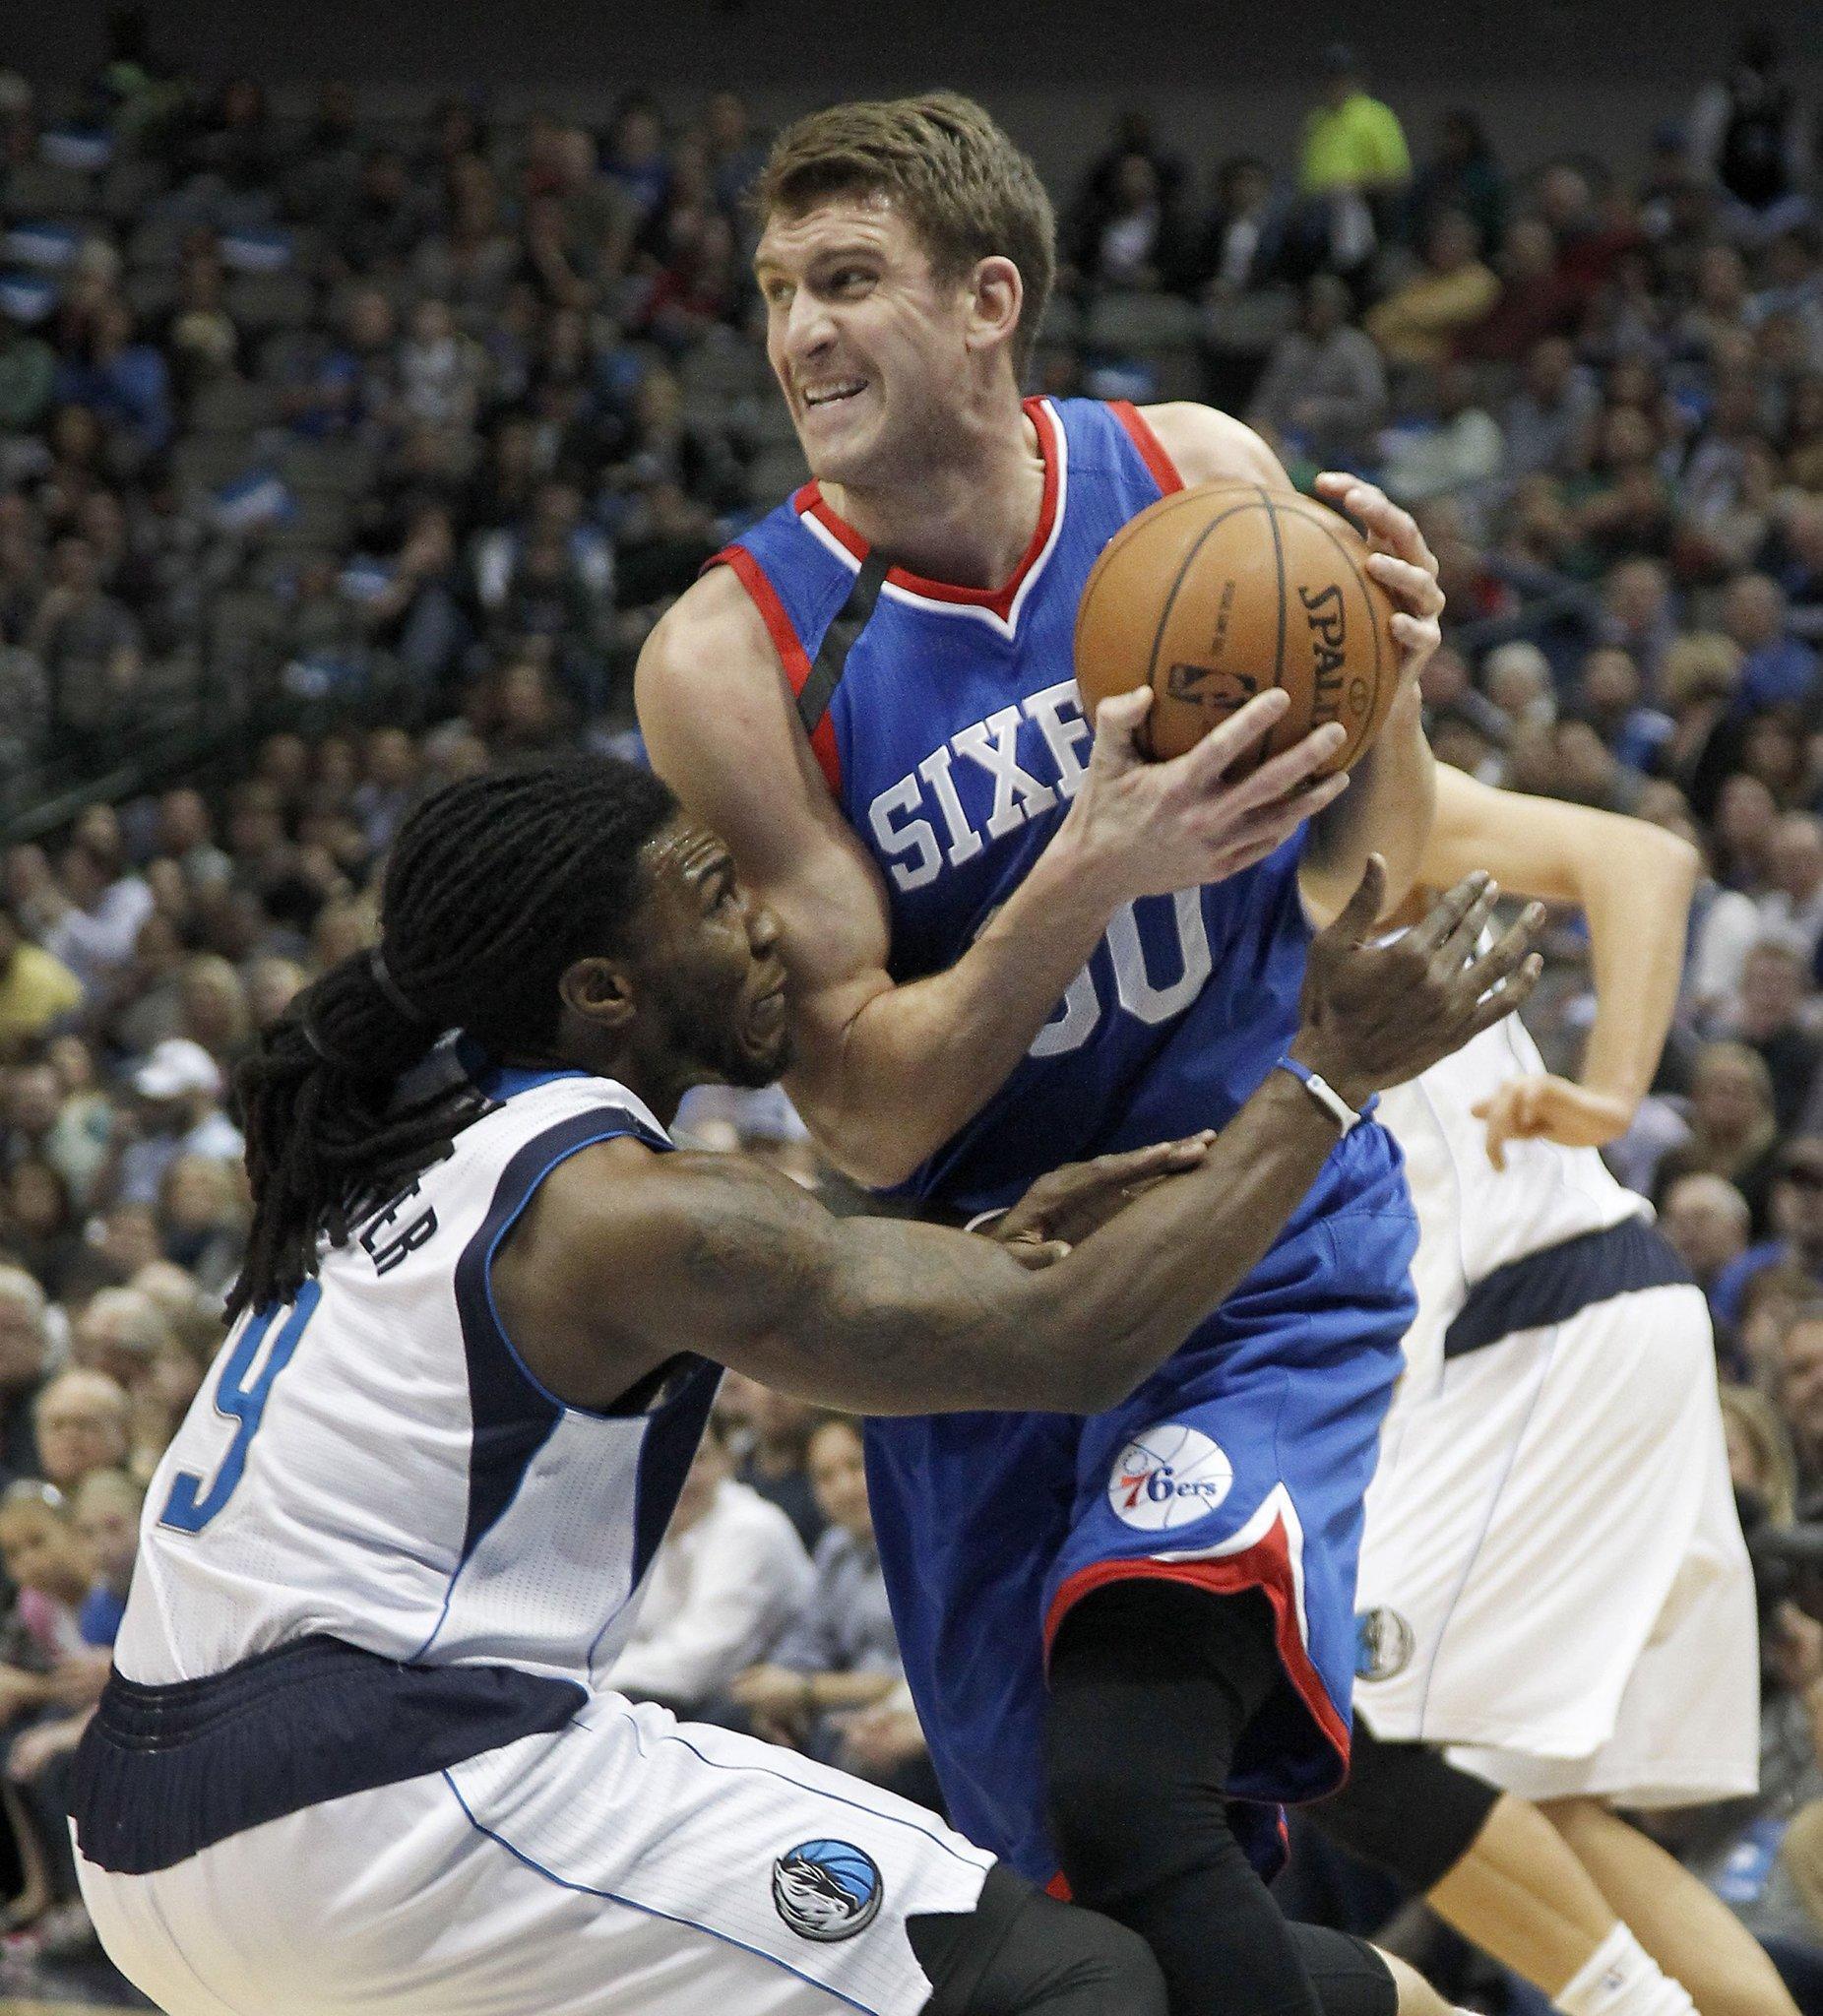 Jae Crowder of the Dallas Mavericks pressures Spencer Hawes of the Philadelphia 76ers.